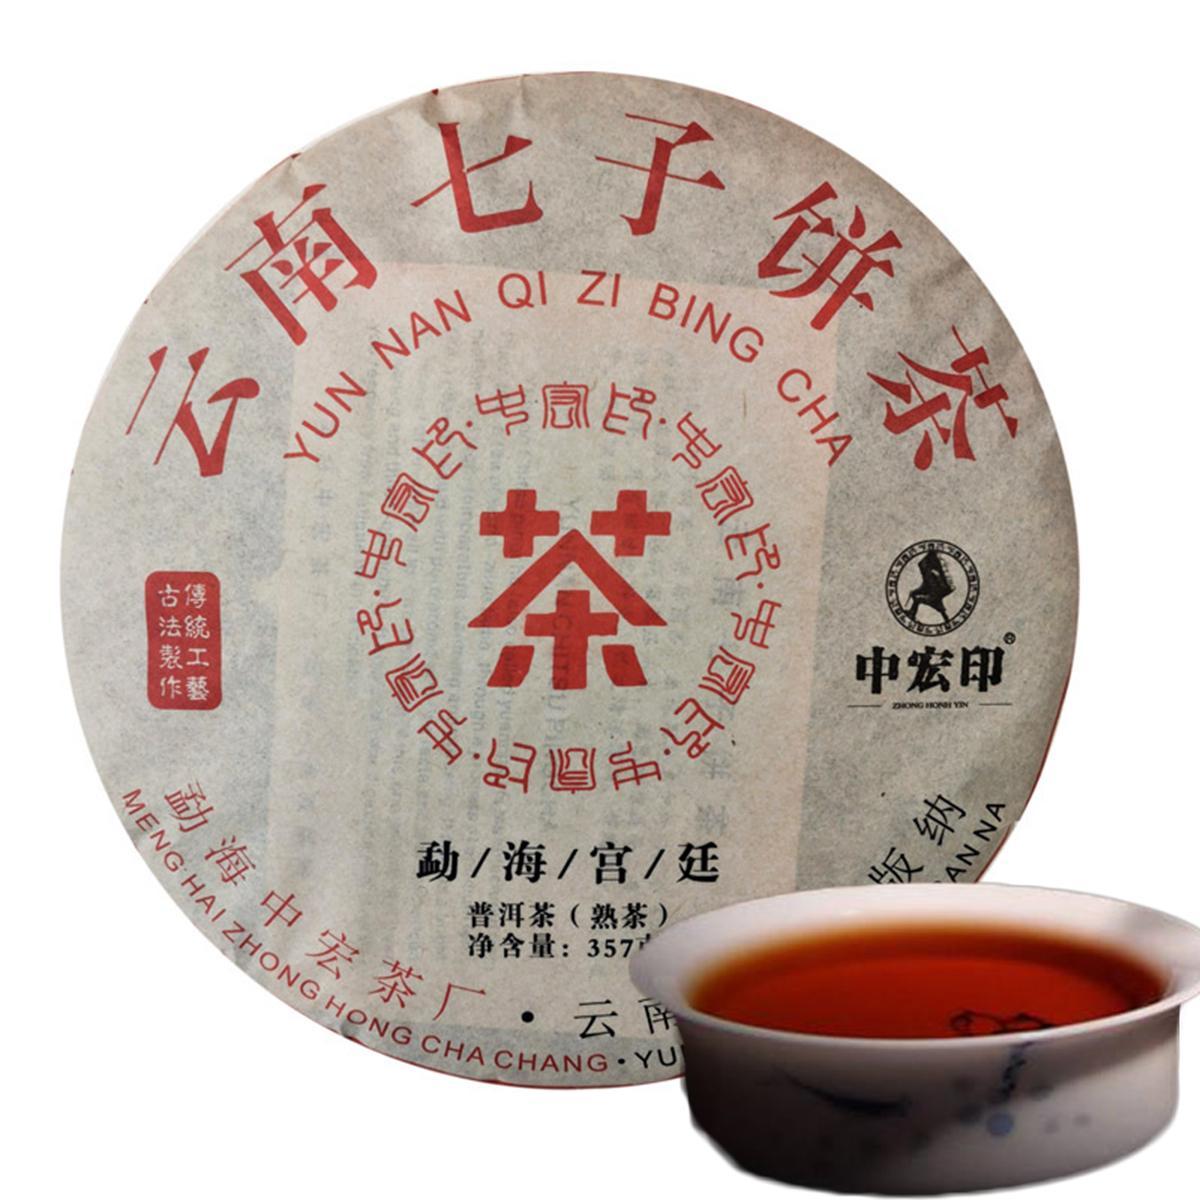 357g Maturo Puer Tè Yunnan Tè Brand Fermentato Puer Torta Organismo Natural Pu'er Più antico albero cotto Puer Black Puerh Tè verde